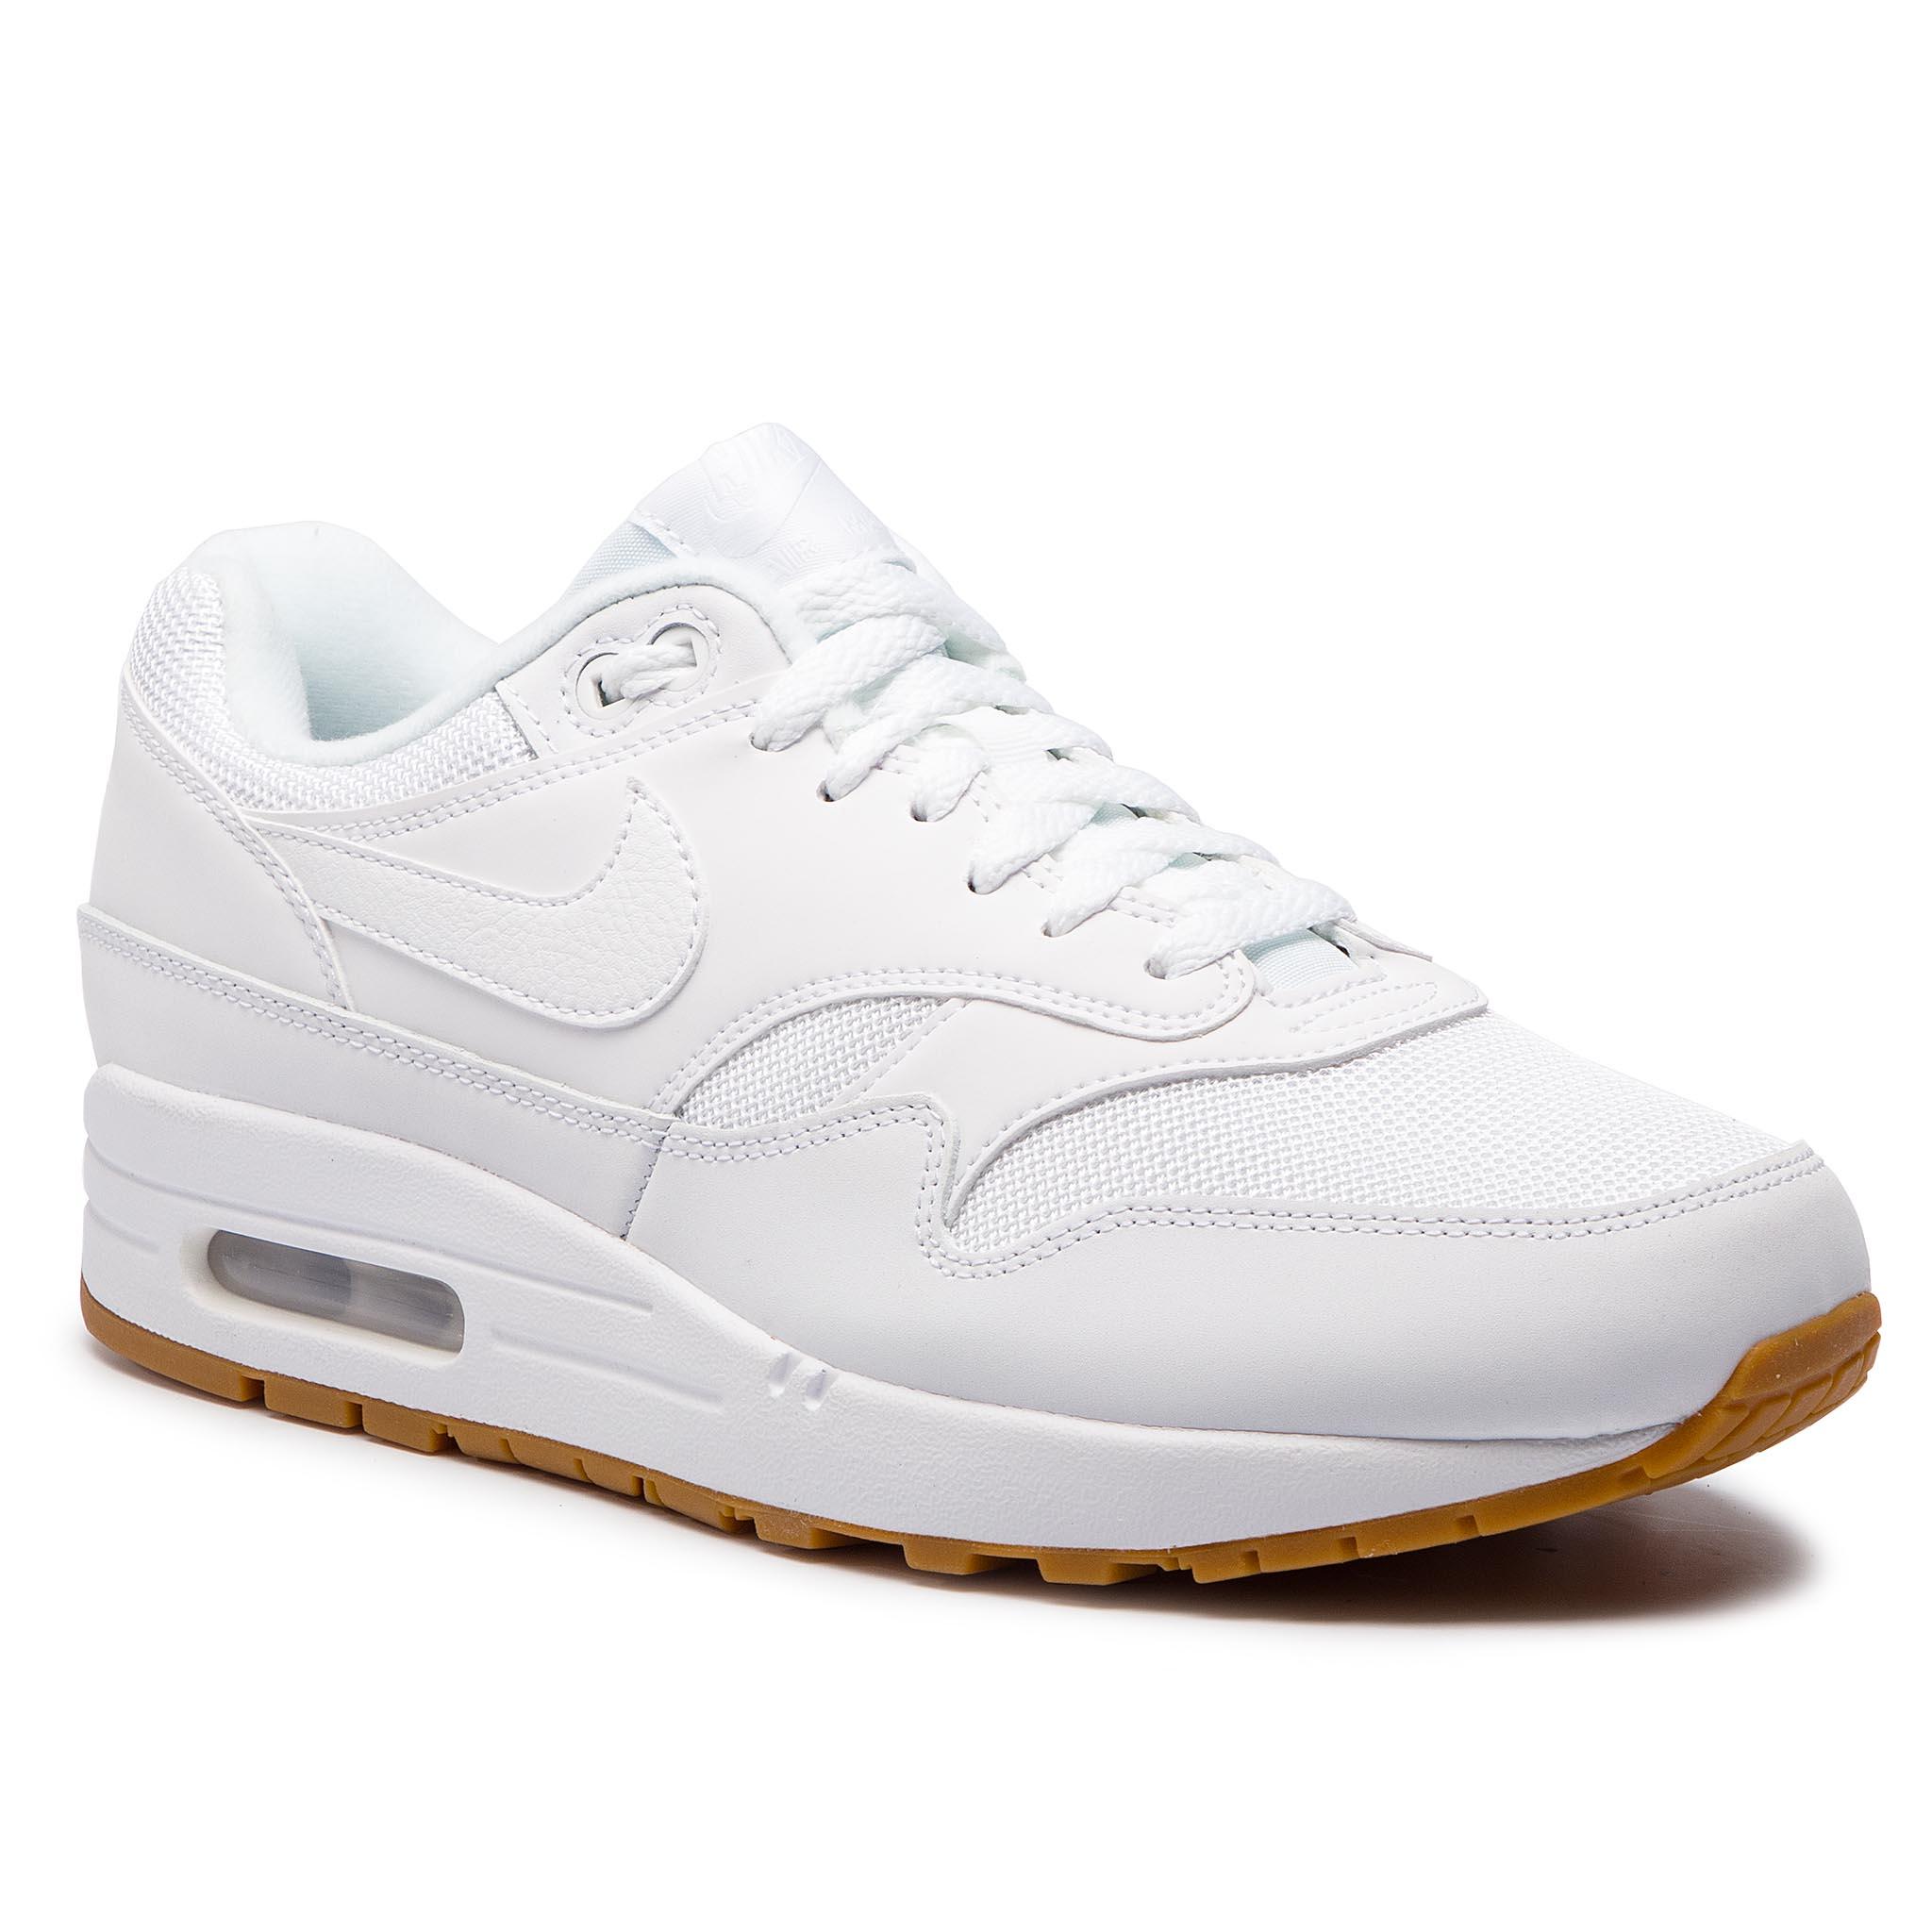 new style bafc1 b4abf Shoes NIKE Air Max 1 AH8145 109 White White White